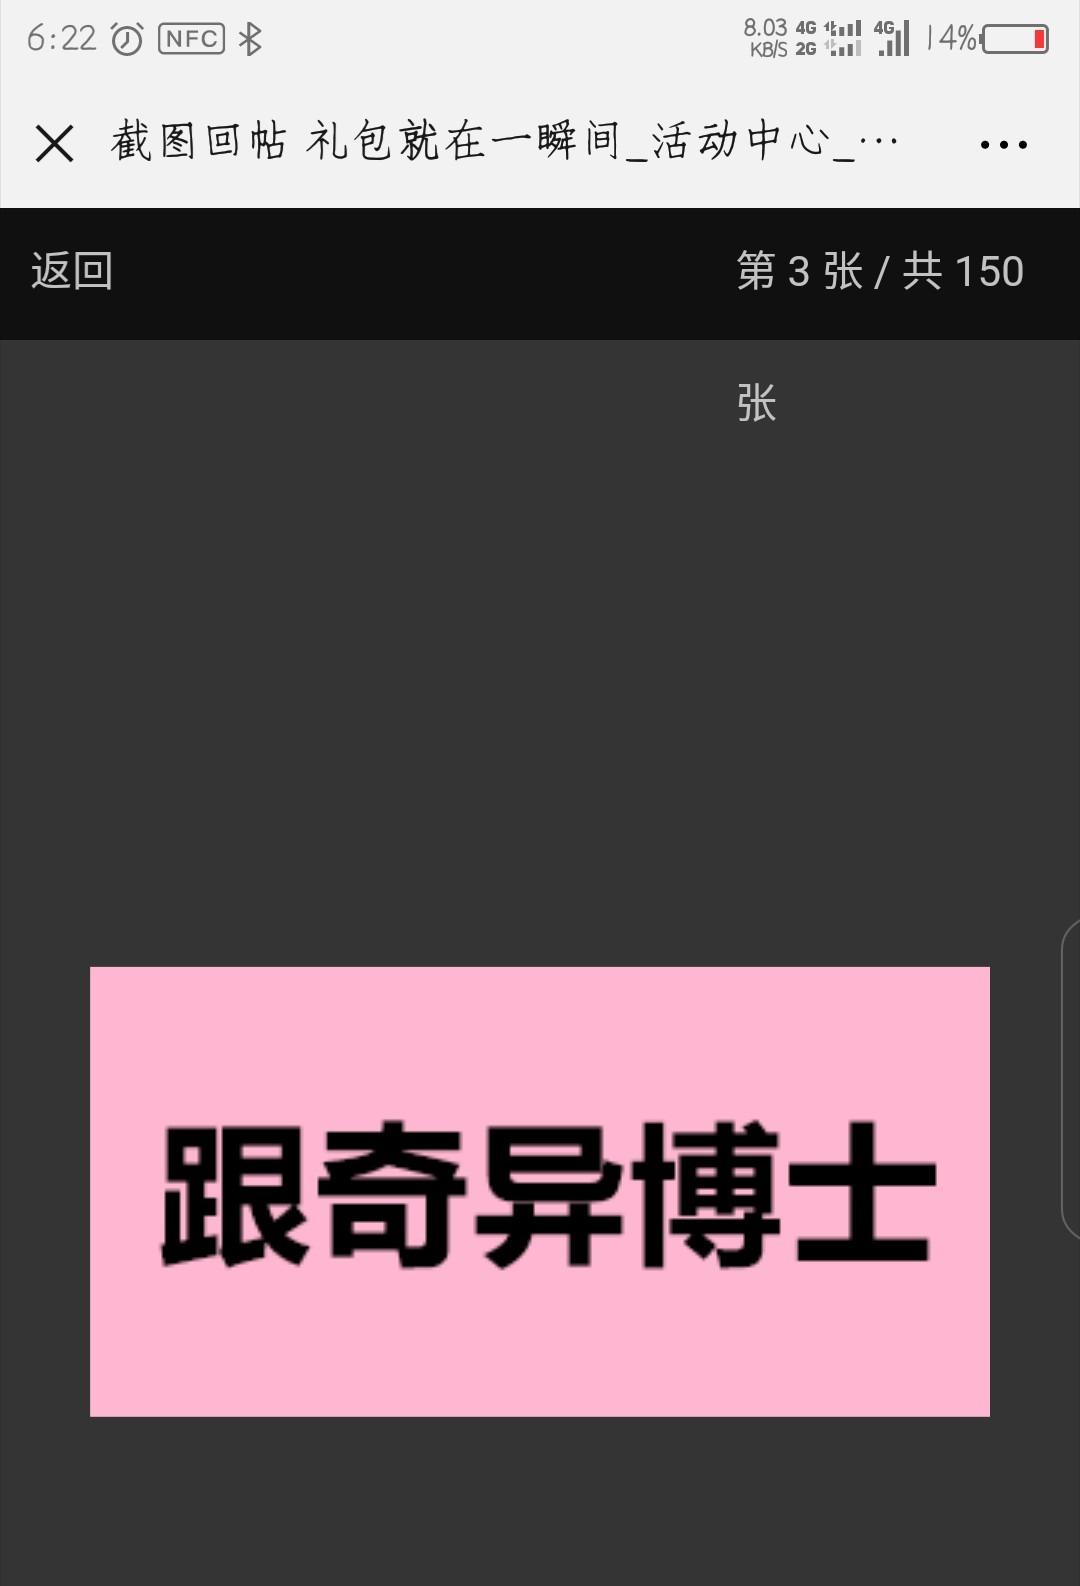 IMG_20190725_182354.jpg